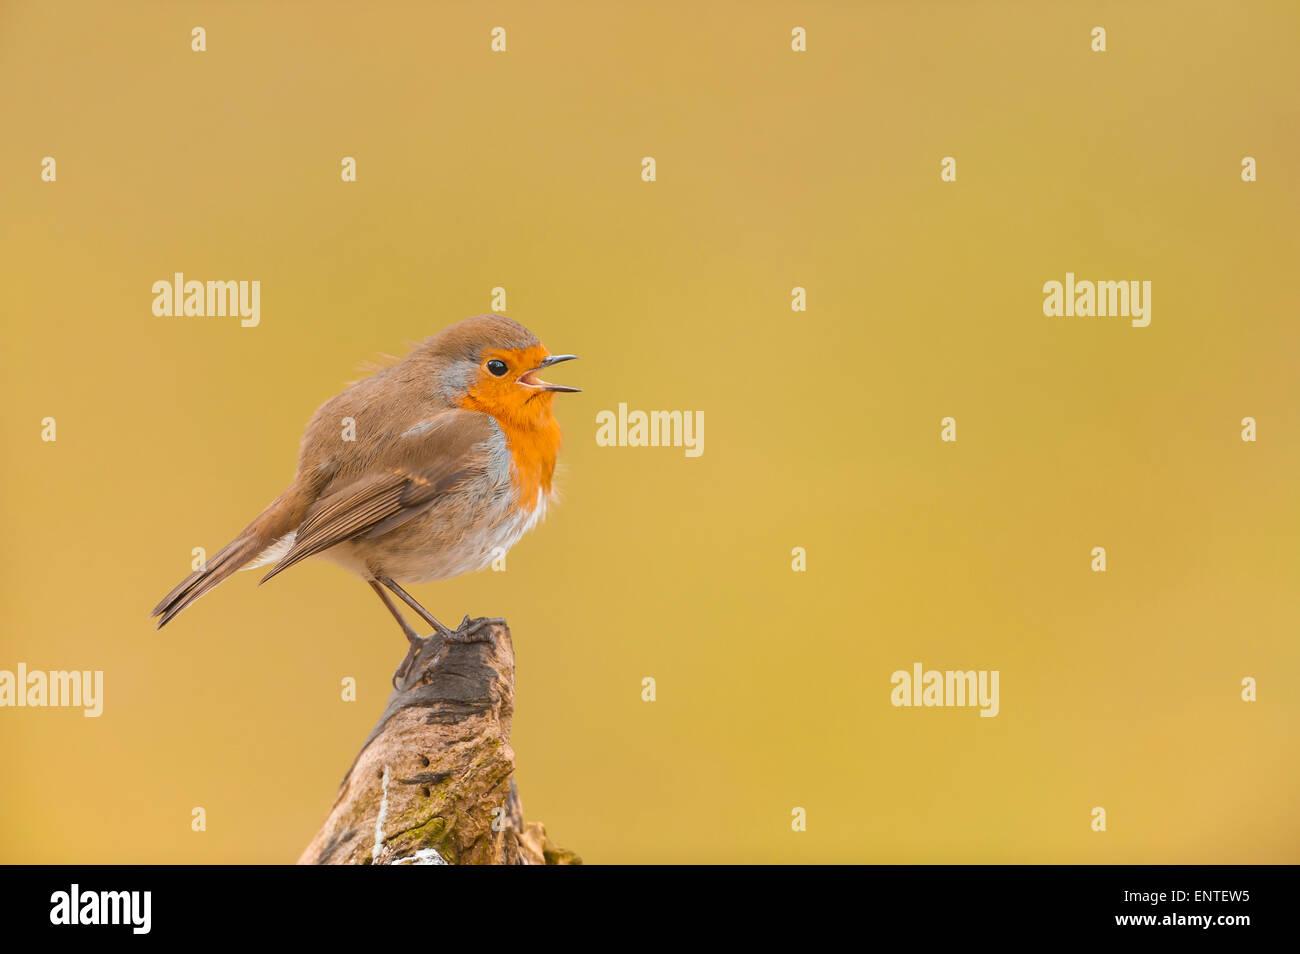 Close Up retrato de un pequeño petirrojo (Erithacus rubecula) pájaros cantando en un jardín, REINO Imagen De Stock